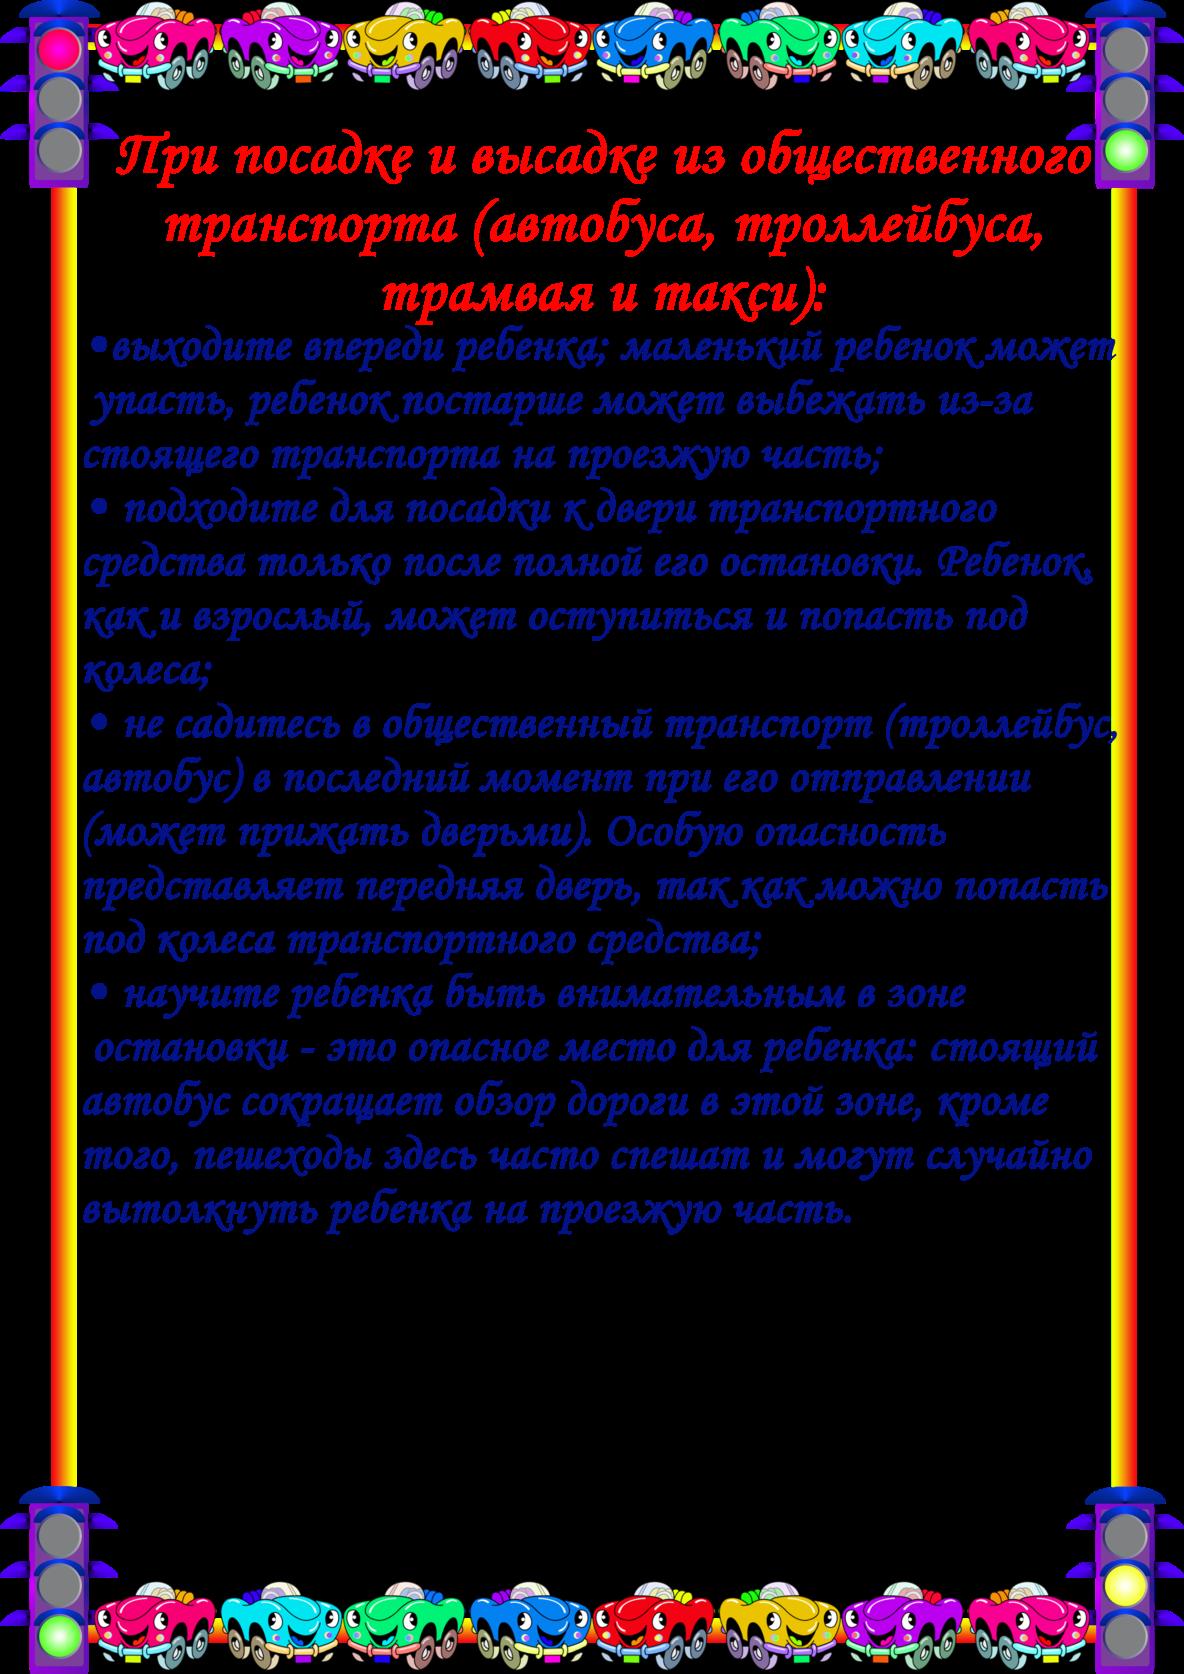 http://dou12.86mmc-megion.edusite.ru/DswMedia/kopiya-3-21.png